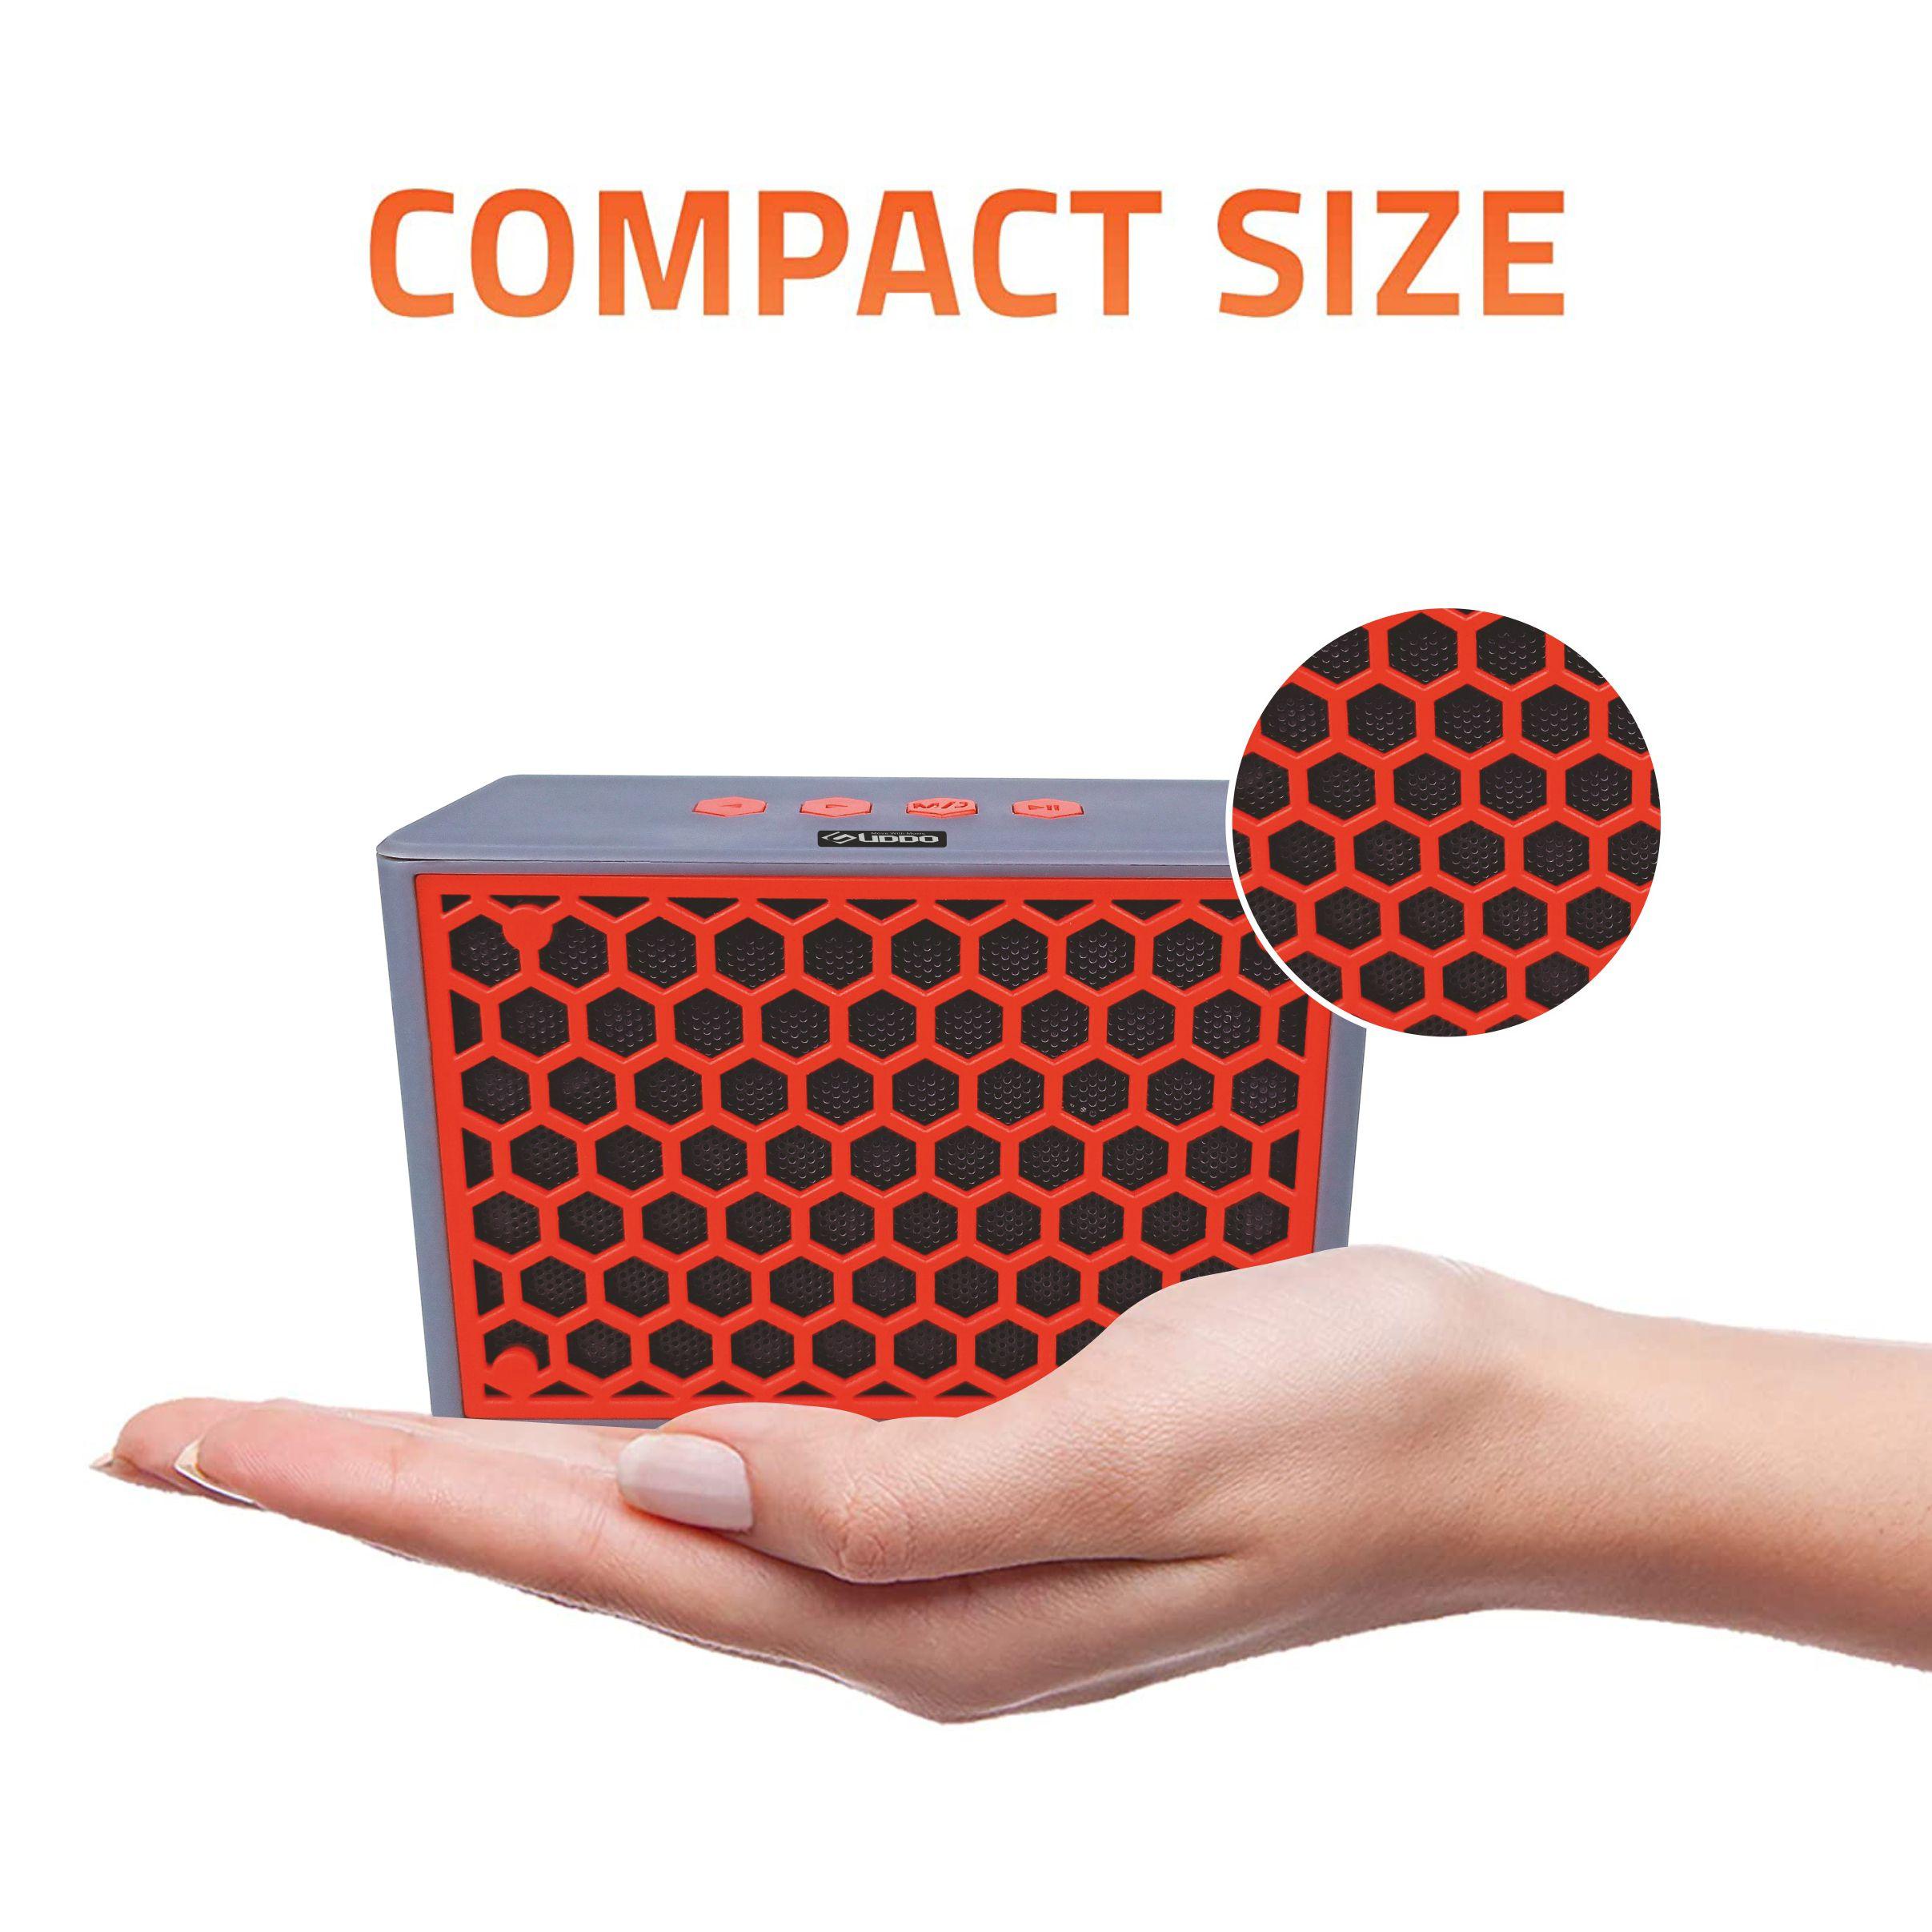 Pingaksh UDDO SP-2018 WIRELESS BLUETOOTH SPEAKER With USB Port for Pen drive /FM Radio/MicroSD Card Support/AUX cable support  Bluetooth Speaker